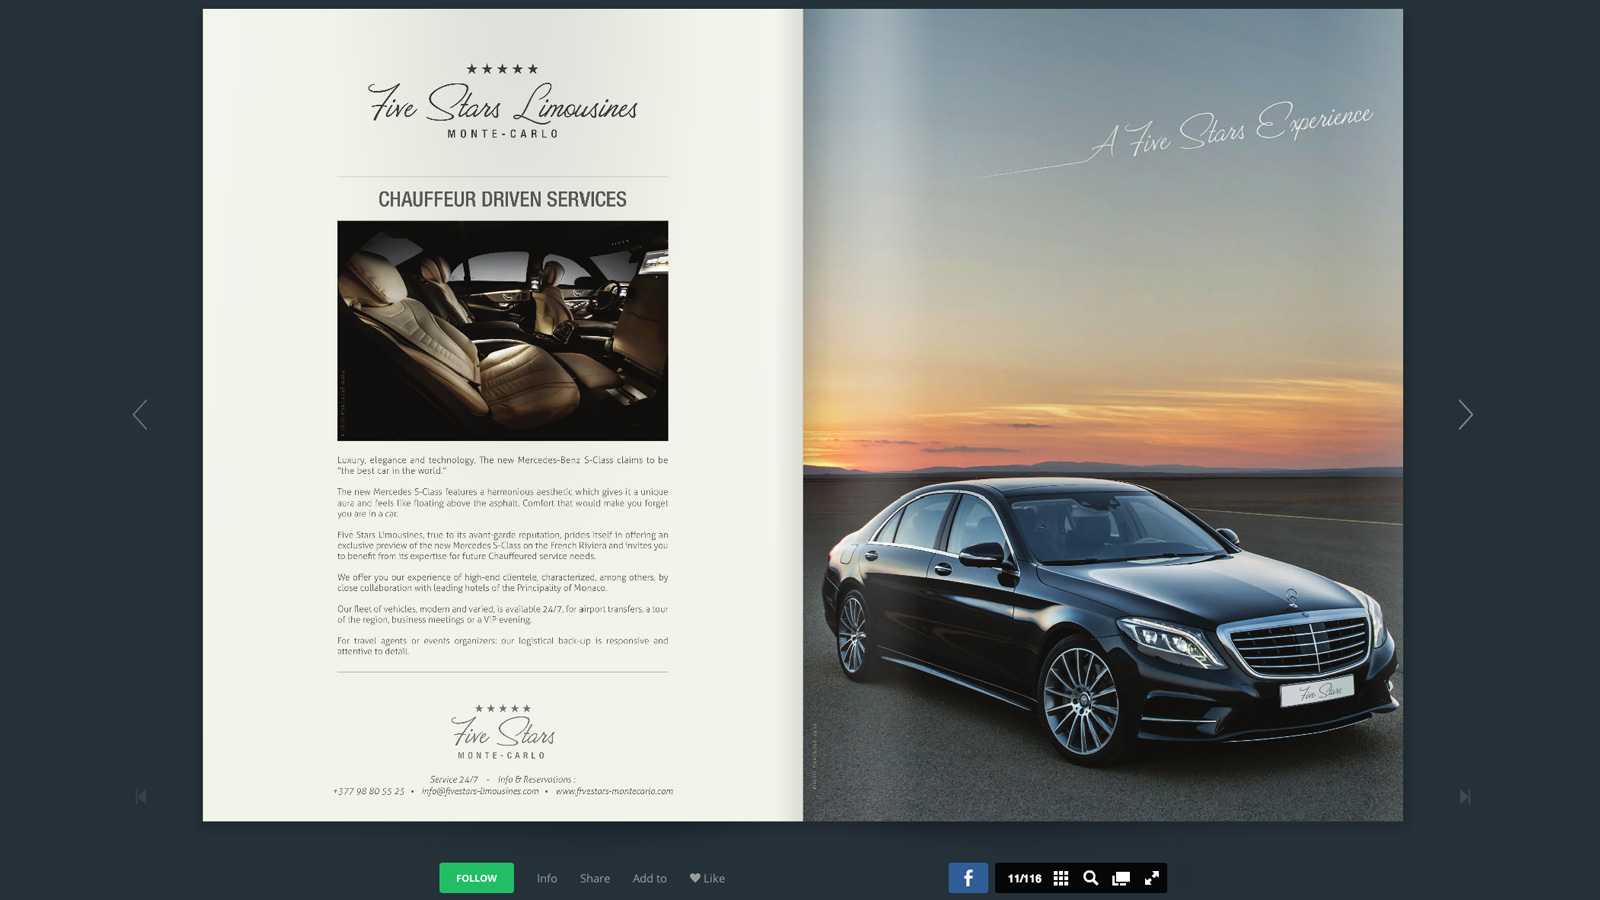 sublime-digital_print_drive-monte-carlo-2